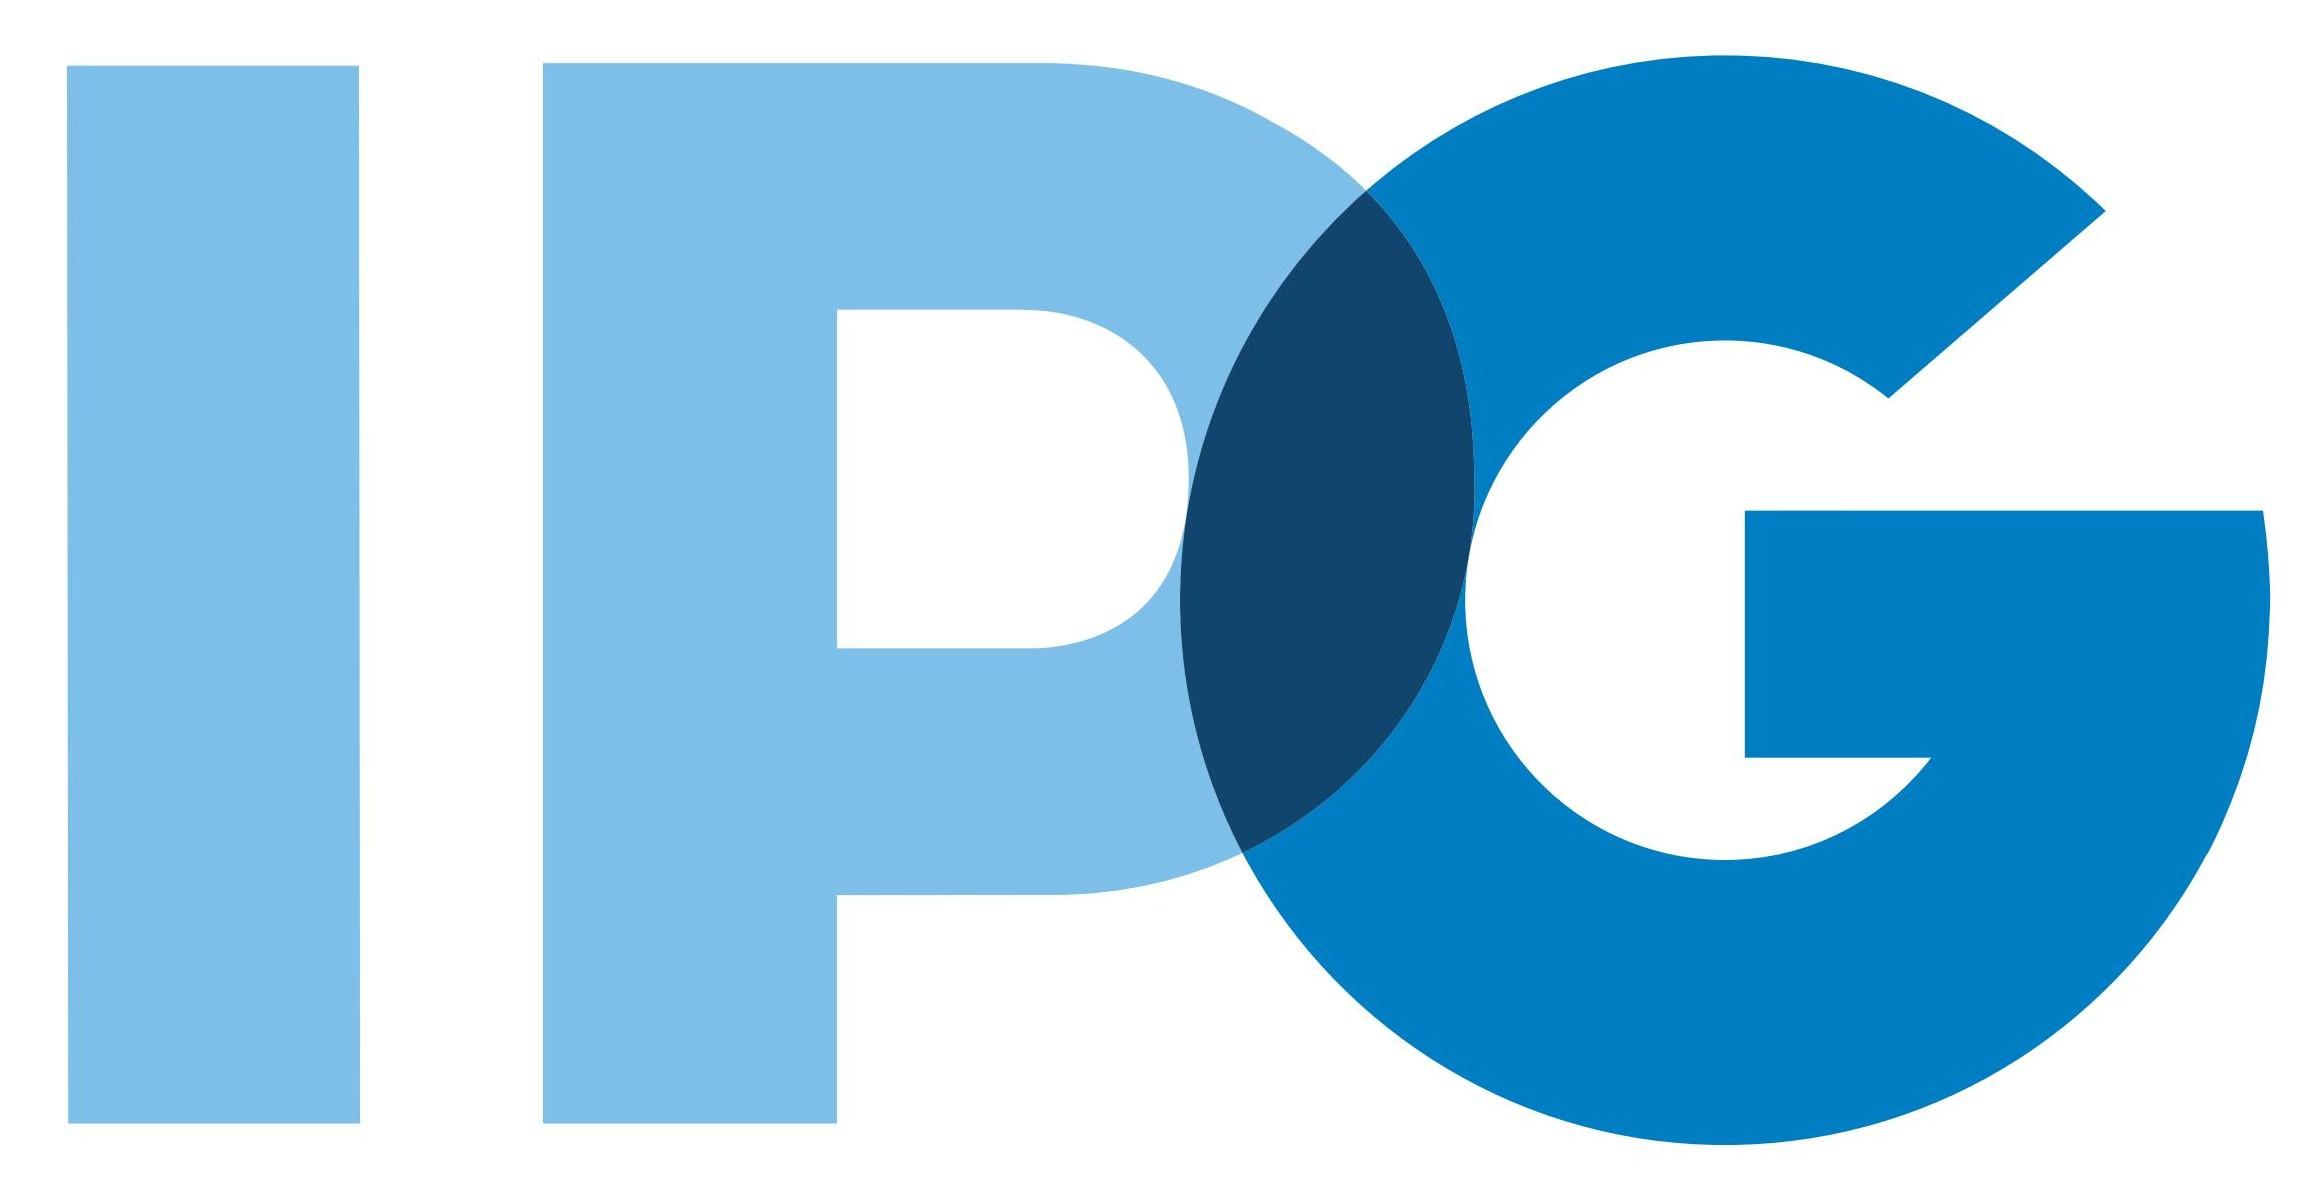 Ipg Photonics Logo The True Value Of IPG ...